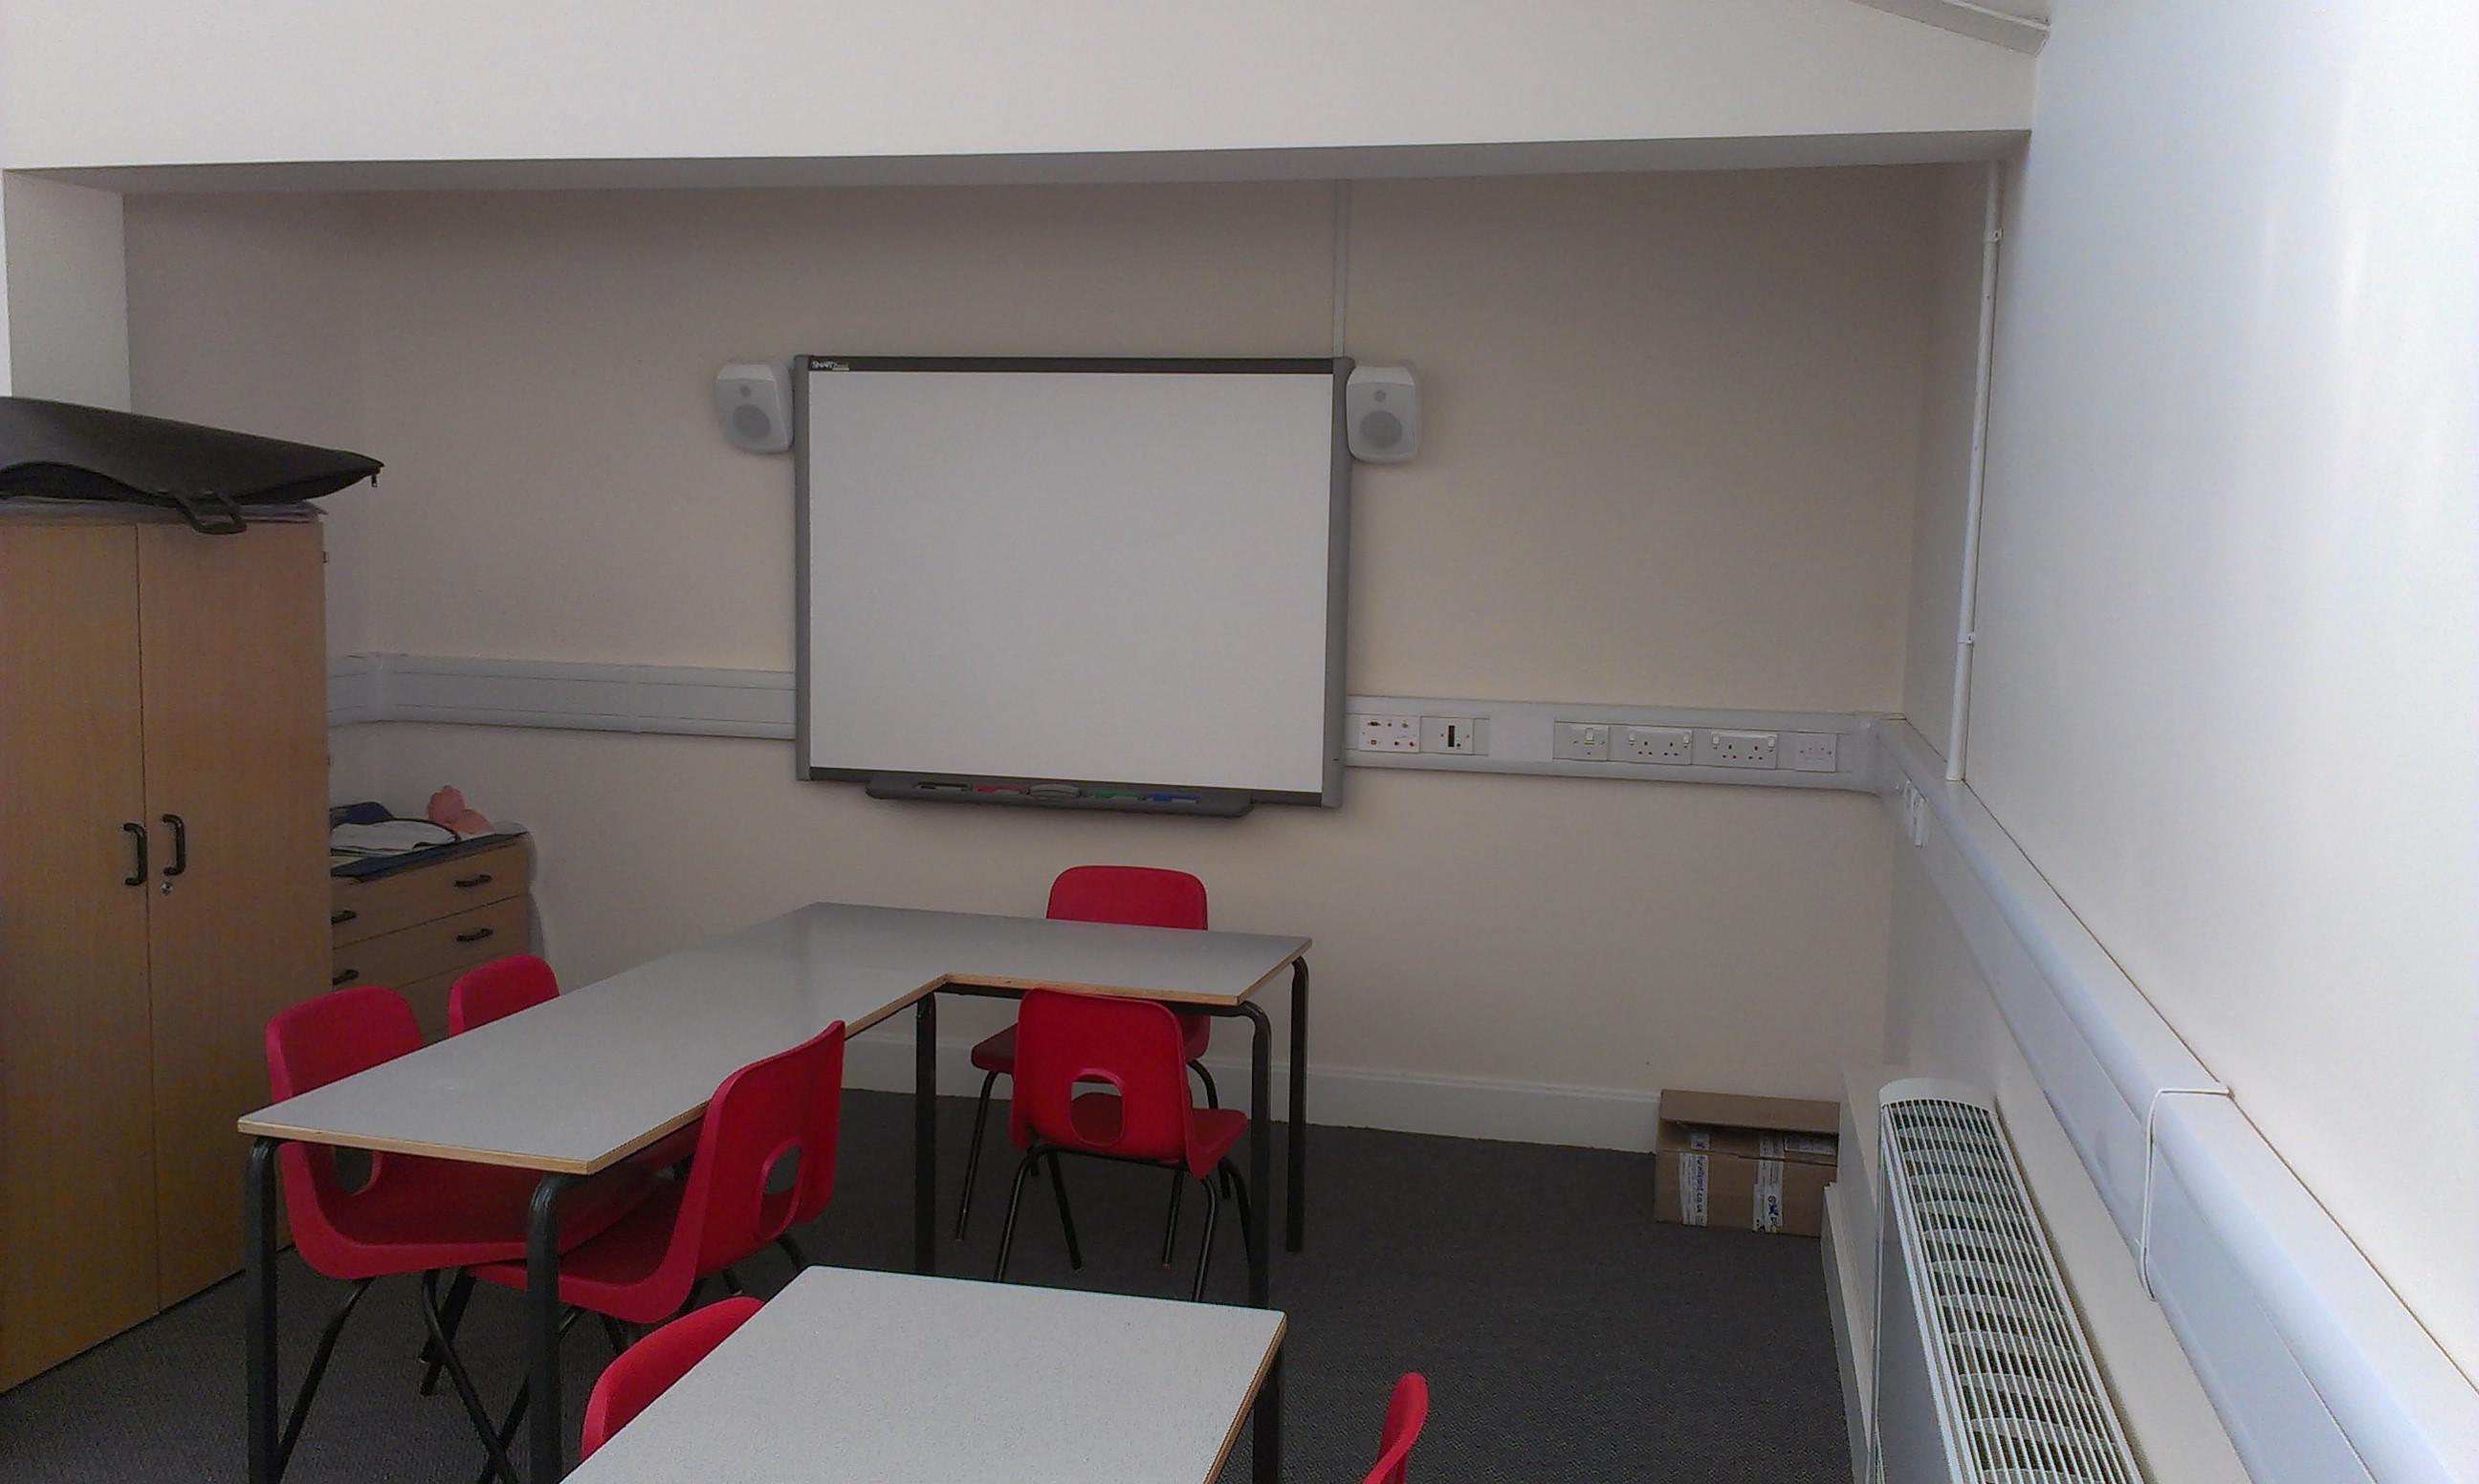 Nurture Area For Elloughton Primary School Double Click It